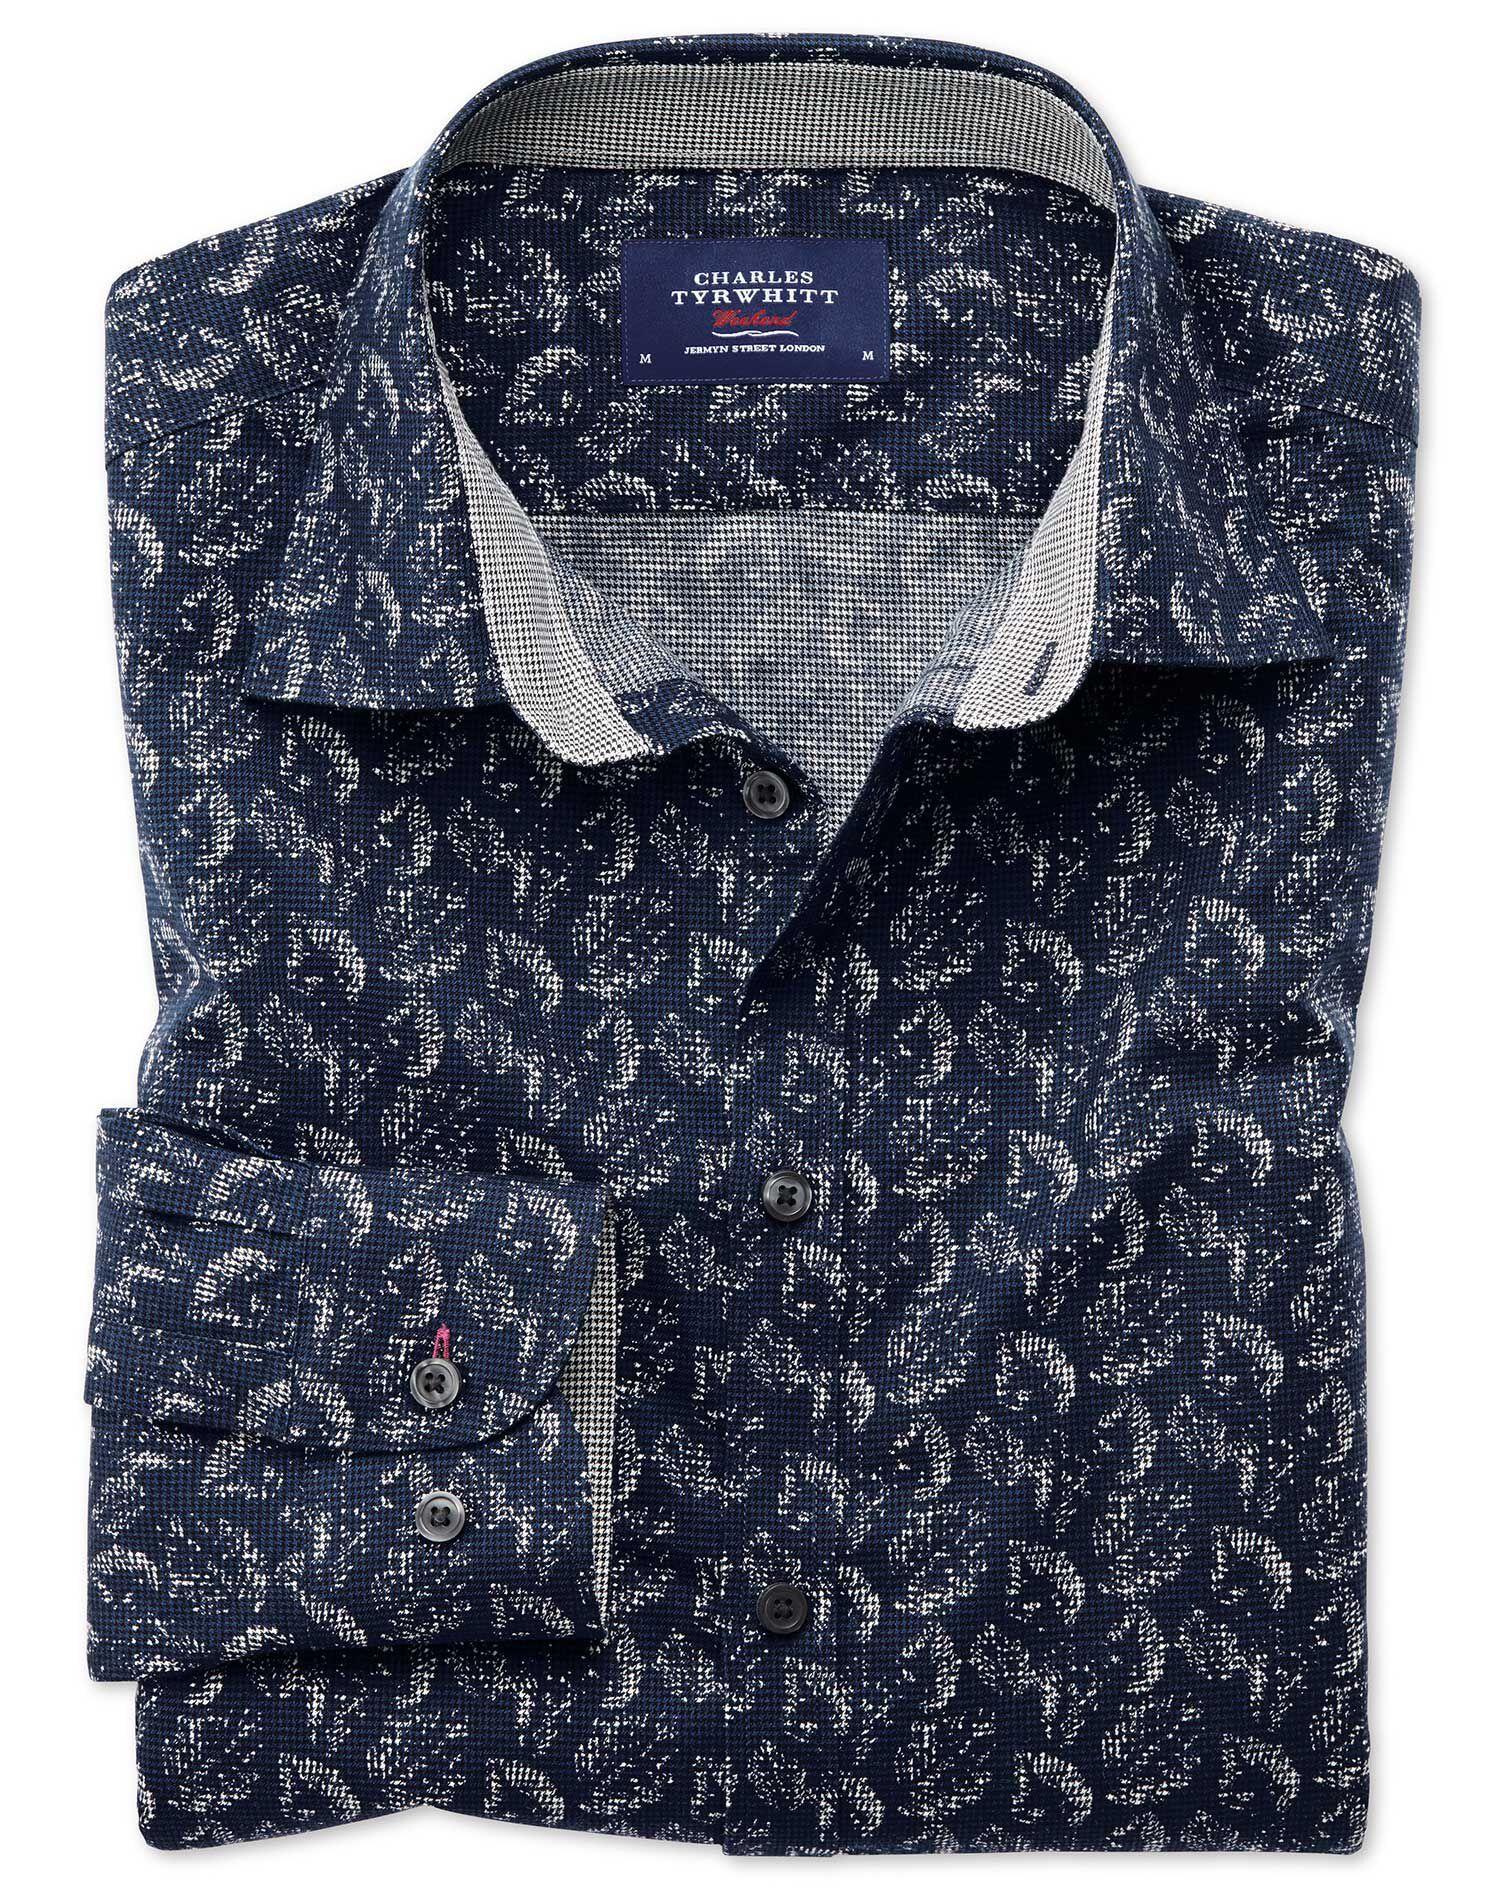 Slim Fit Dark Blue Leaf Print Cotton Shirt Single Cuff Size Medium by Charles Tyrwhitt